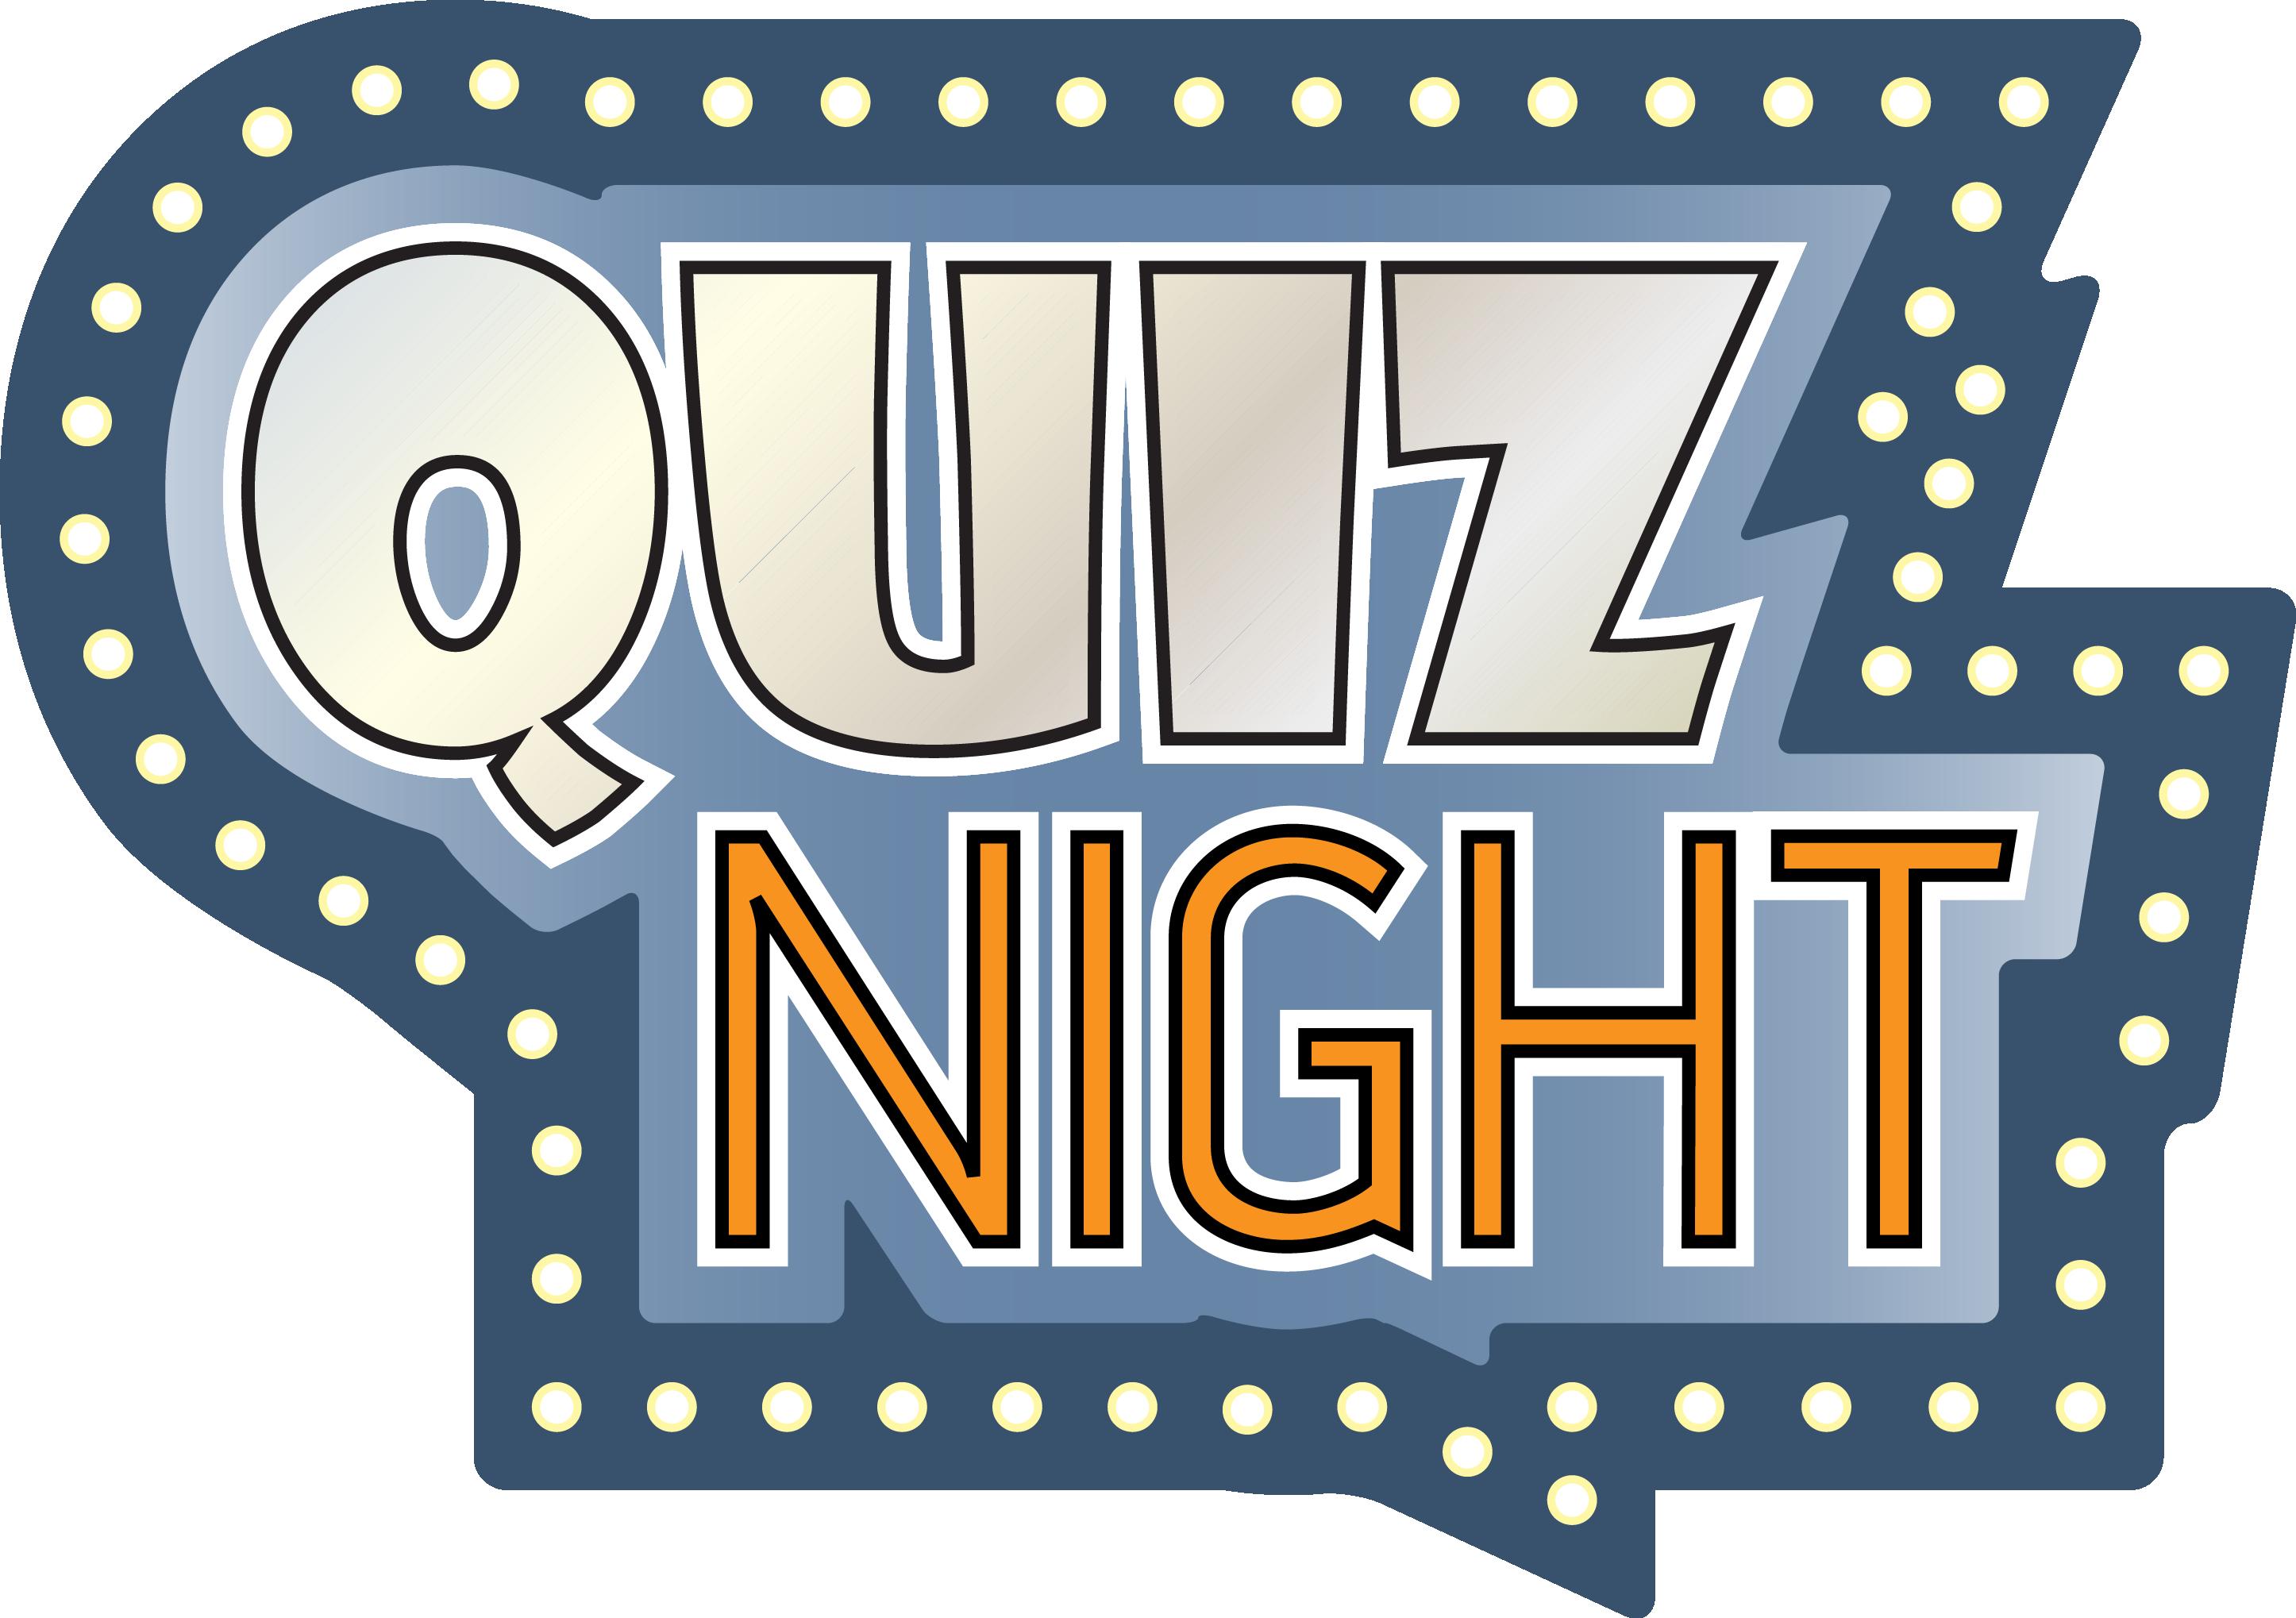 October huddersfield petanque friday. Knowledge clipart pop quiz